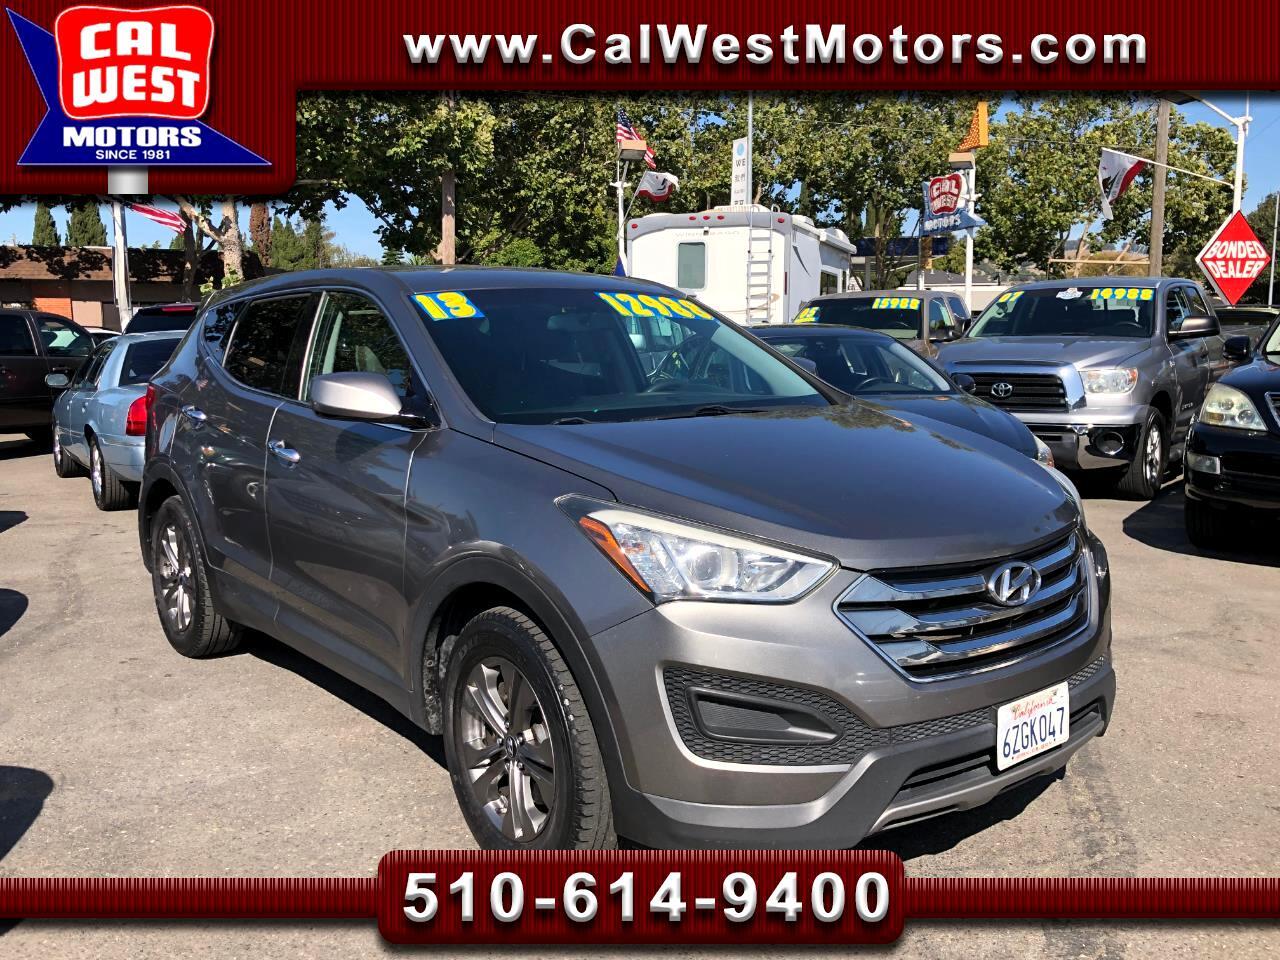 2013 Hyundai Santa Fe AWD Sport SUV 5D Blu2th BUCam VeryClean